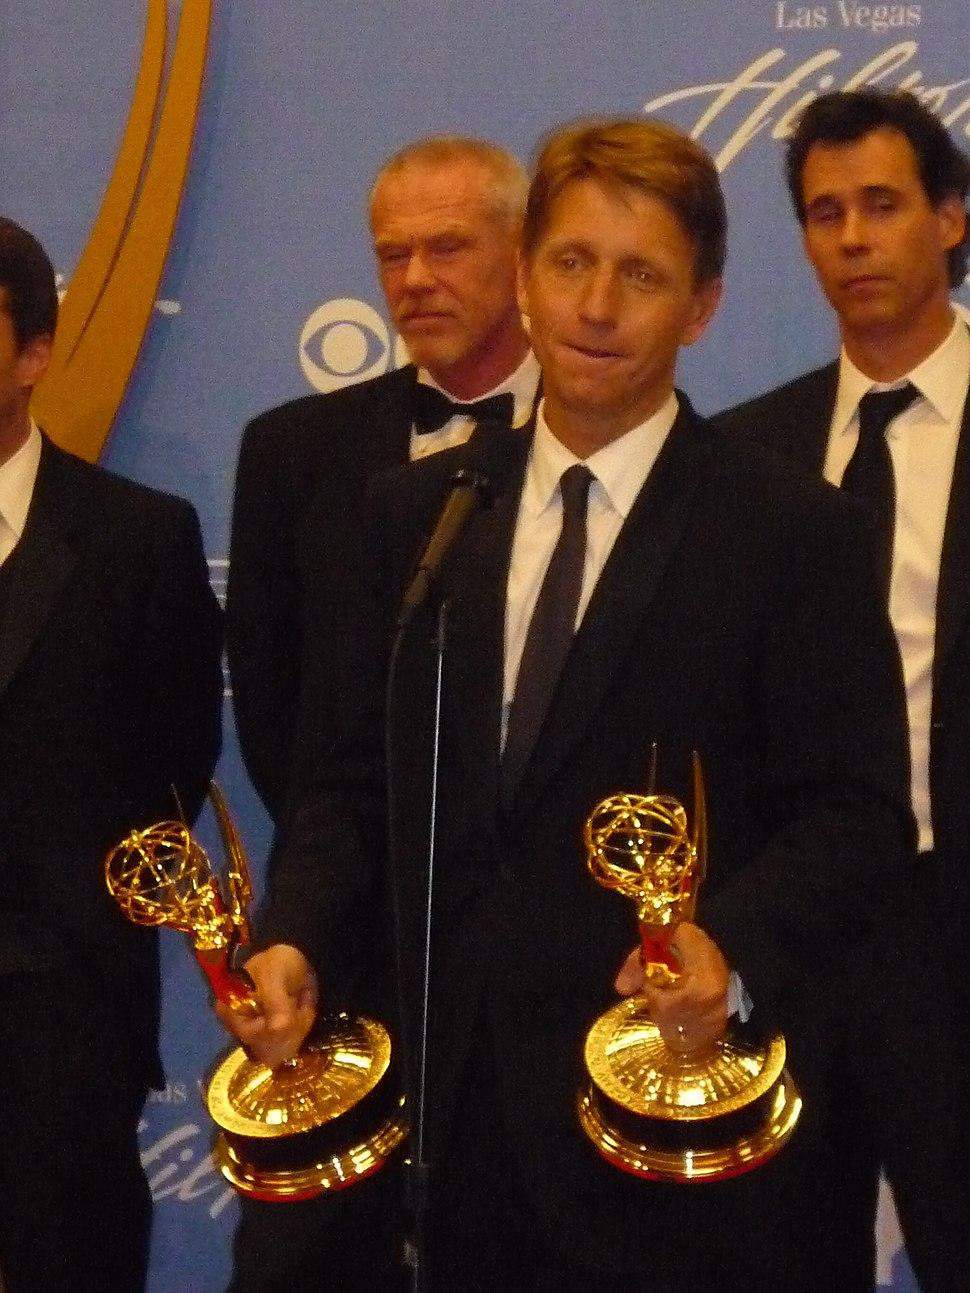 Bradley Bell 2010 Daytime Emmy Awards